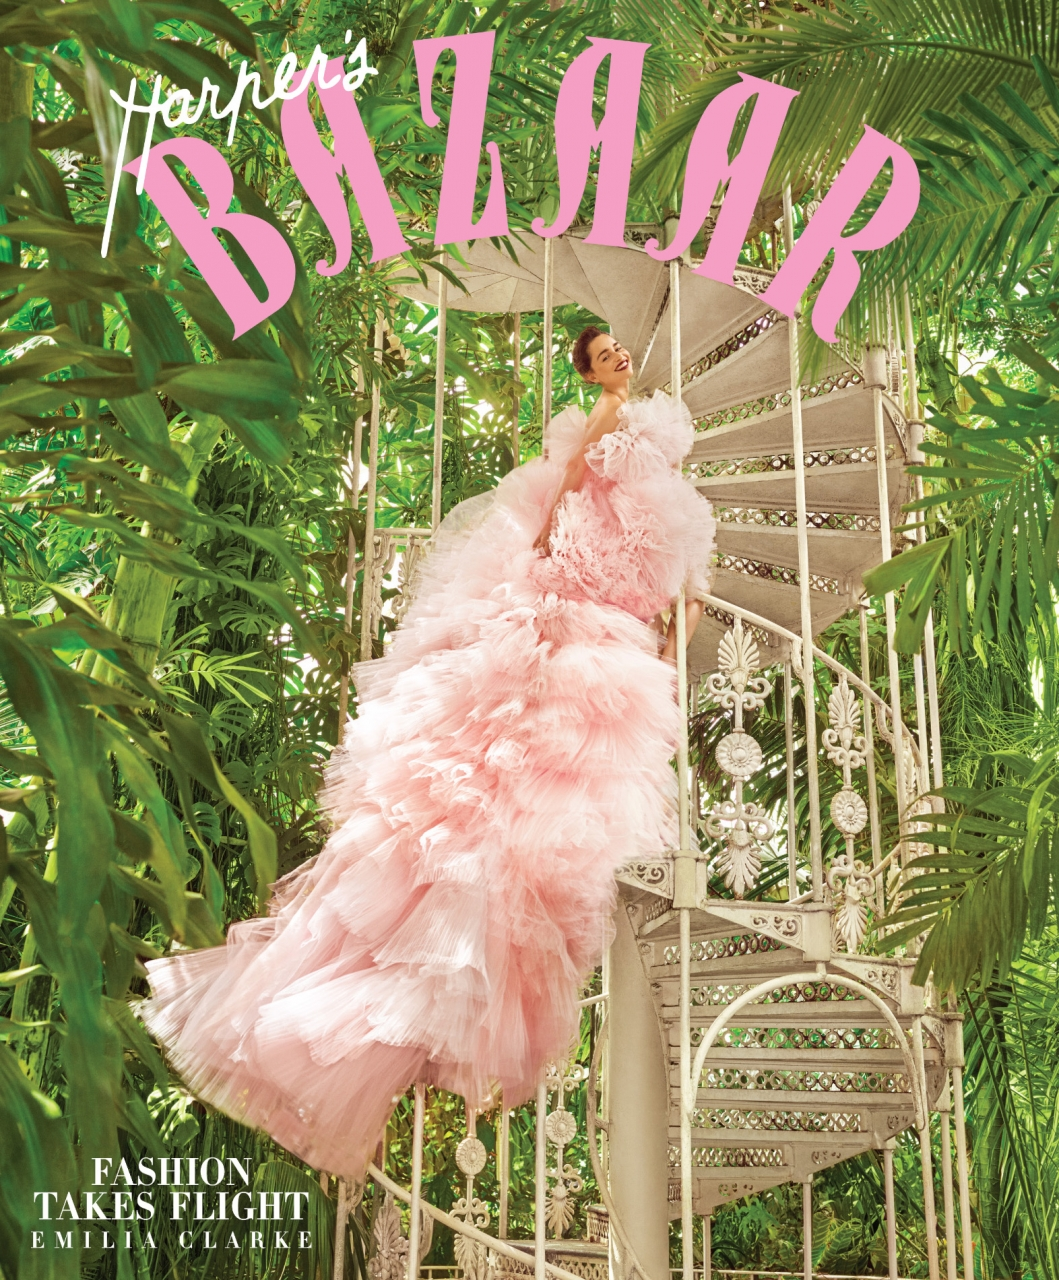 Emilia Clarke by Mariano Vivanco for Harper's Bazaar, December 2017